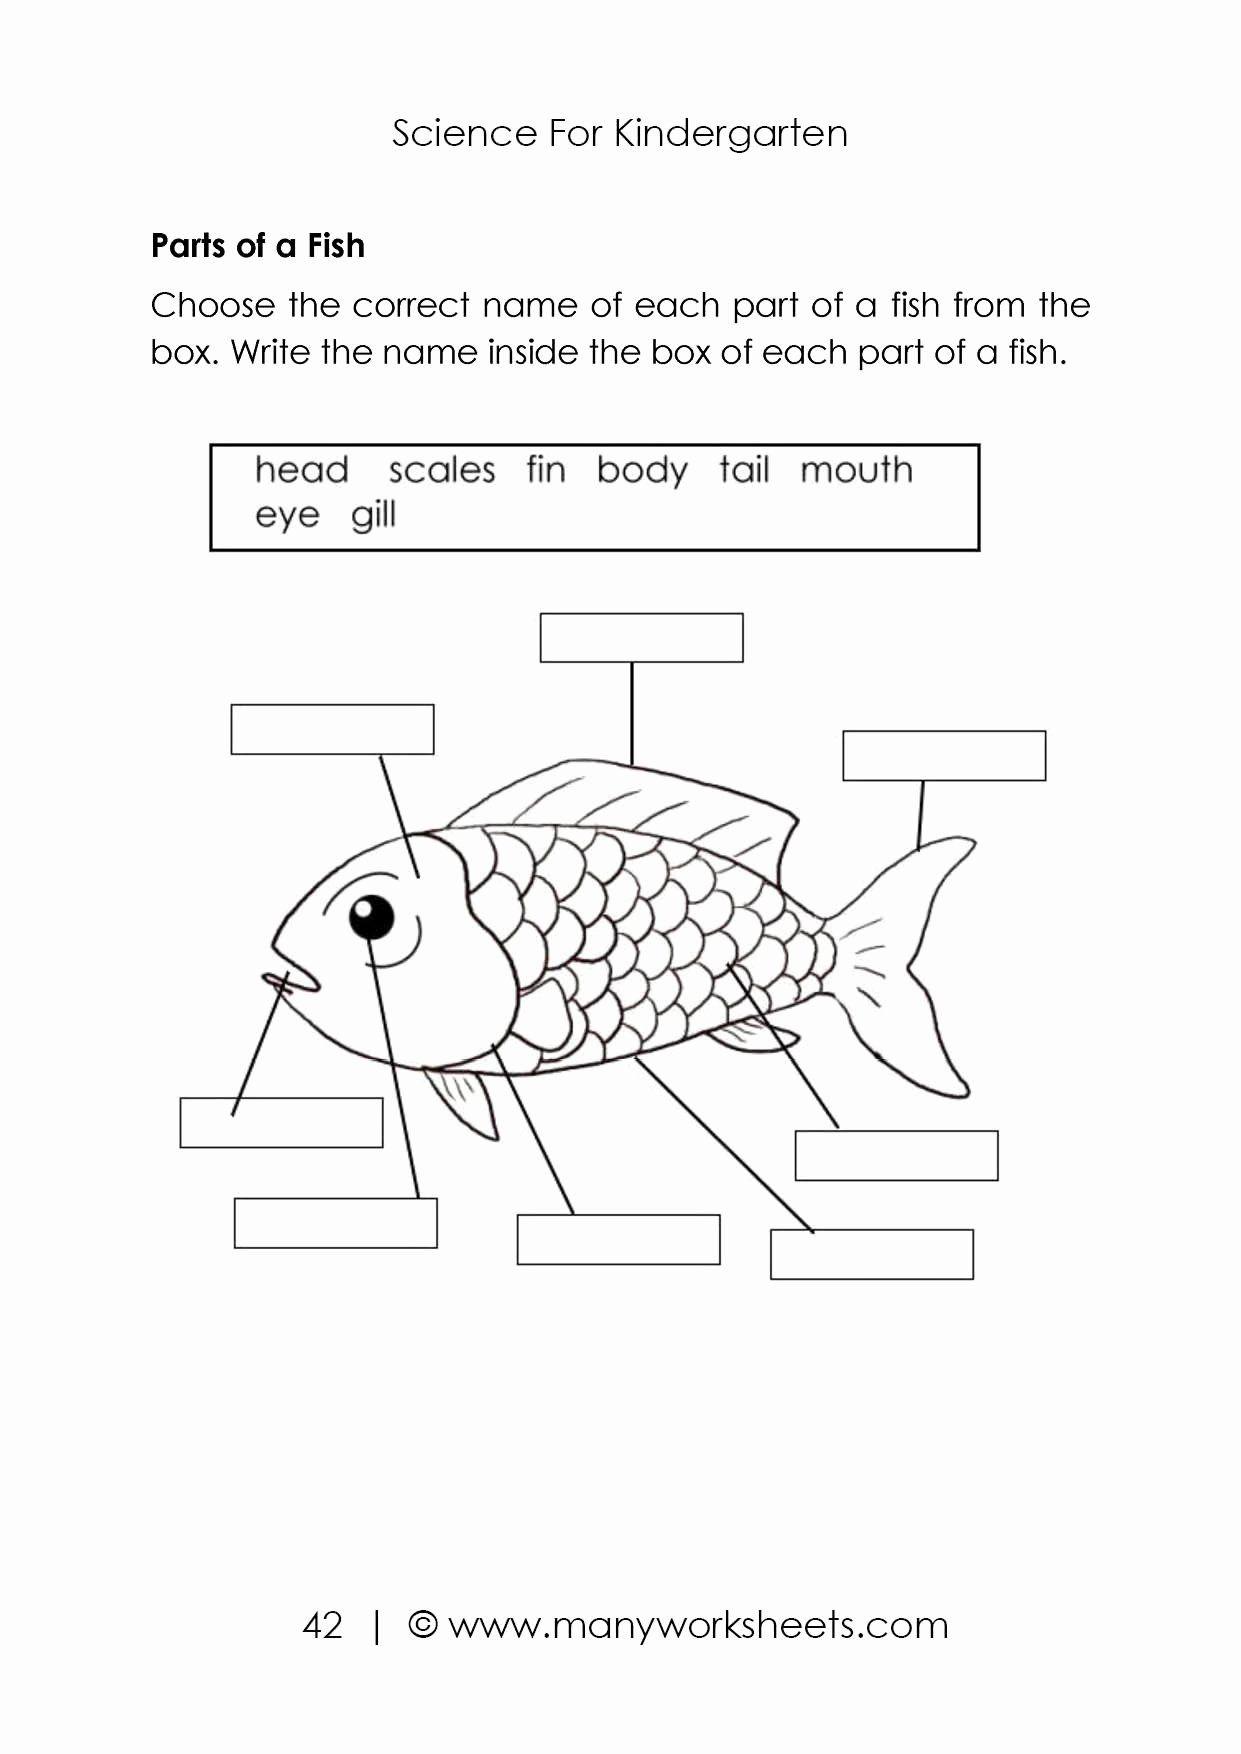 Coloring Vegetables Worksheets Pdf Inspirational Science Worksheets For Kids Parts Of Animals Body In 2020 Animal Worksheets Worksheets For Kids Kindergarten Science